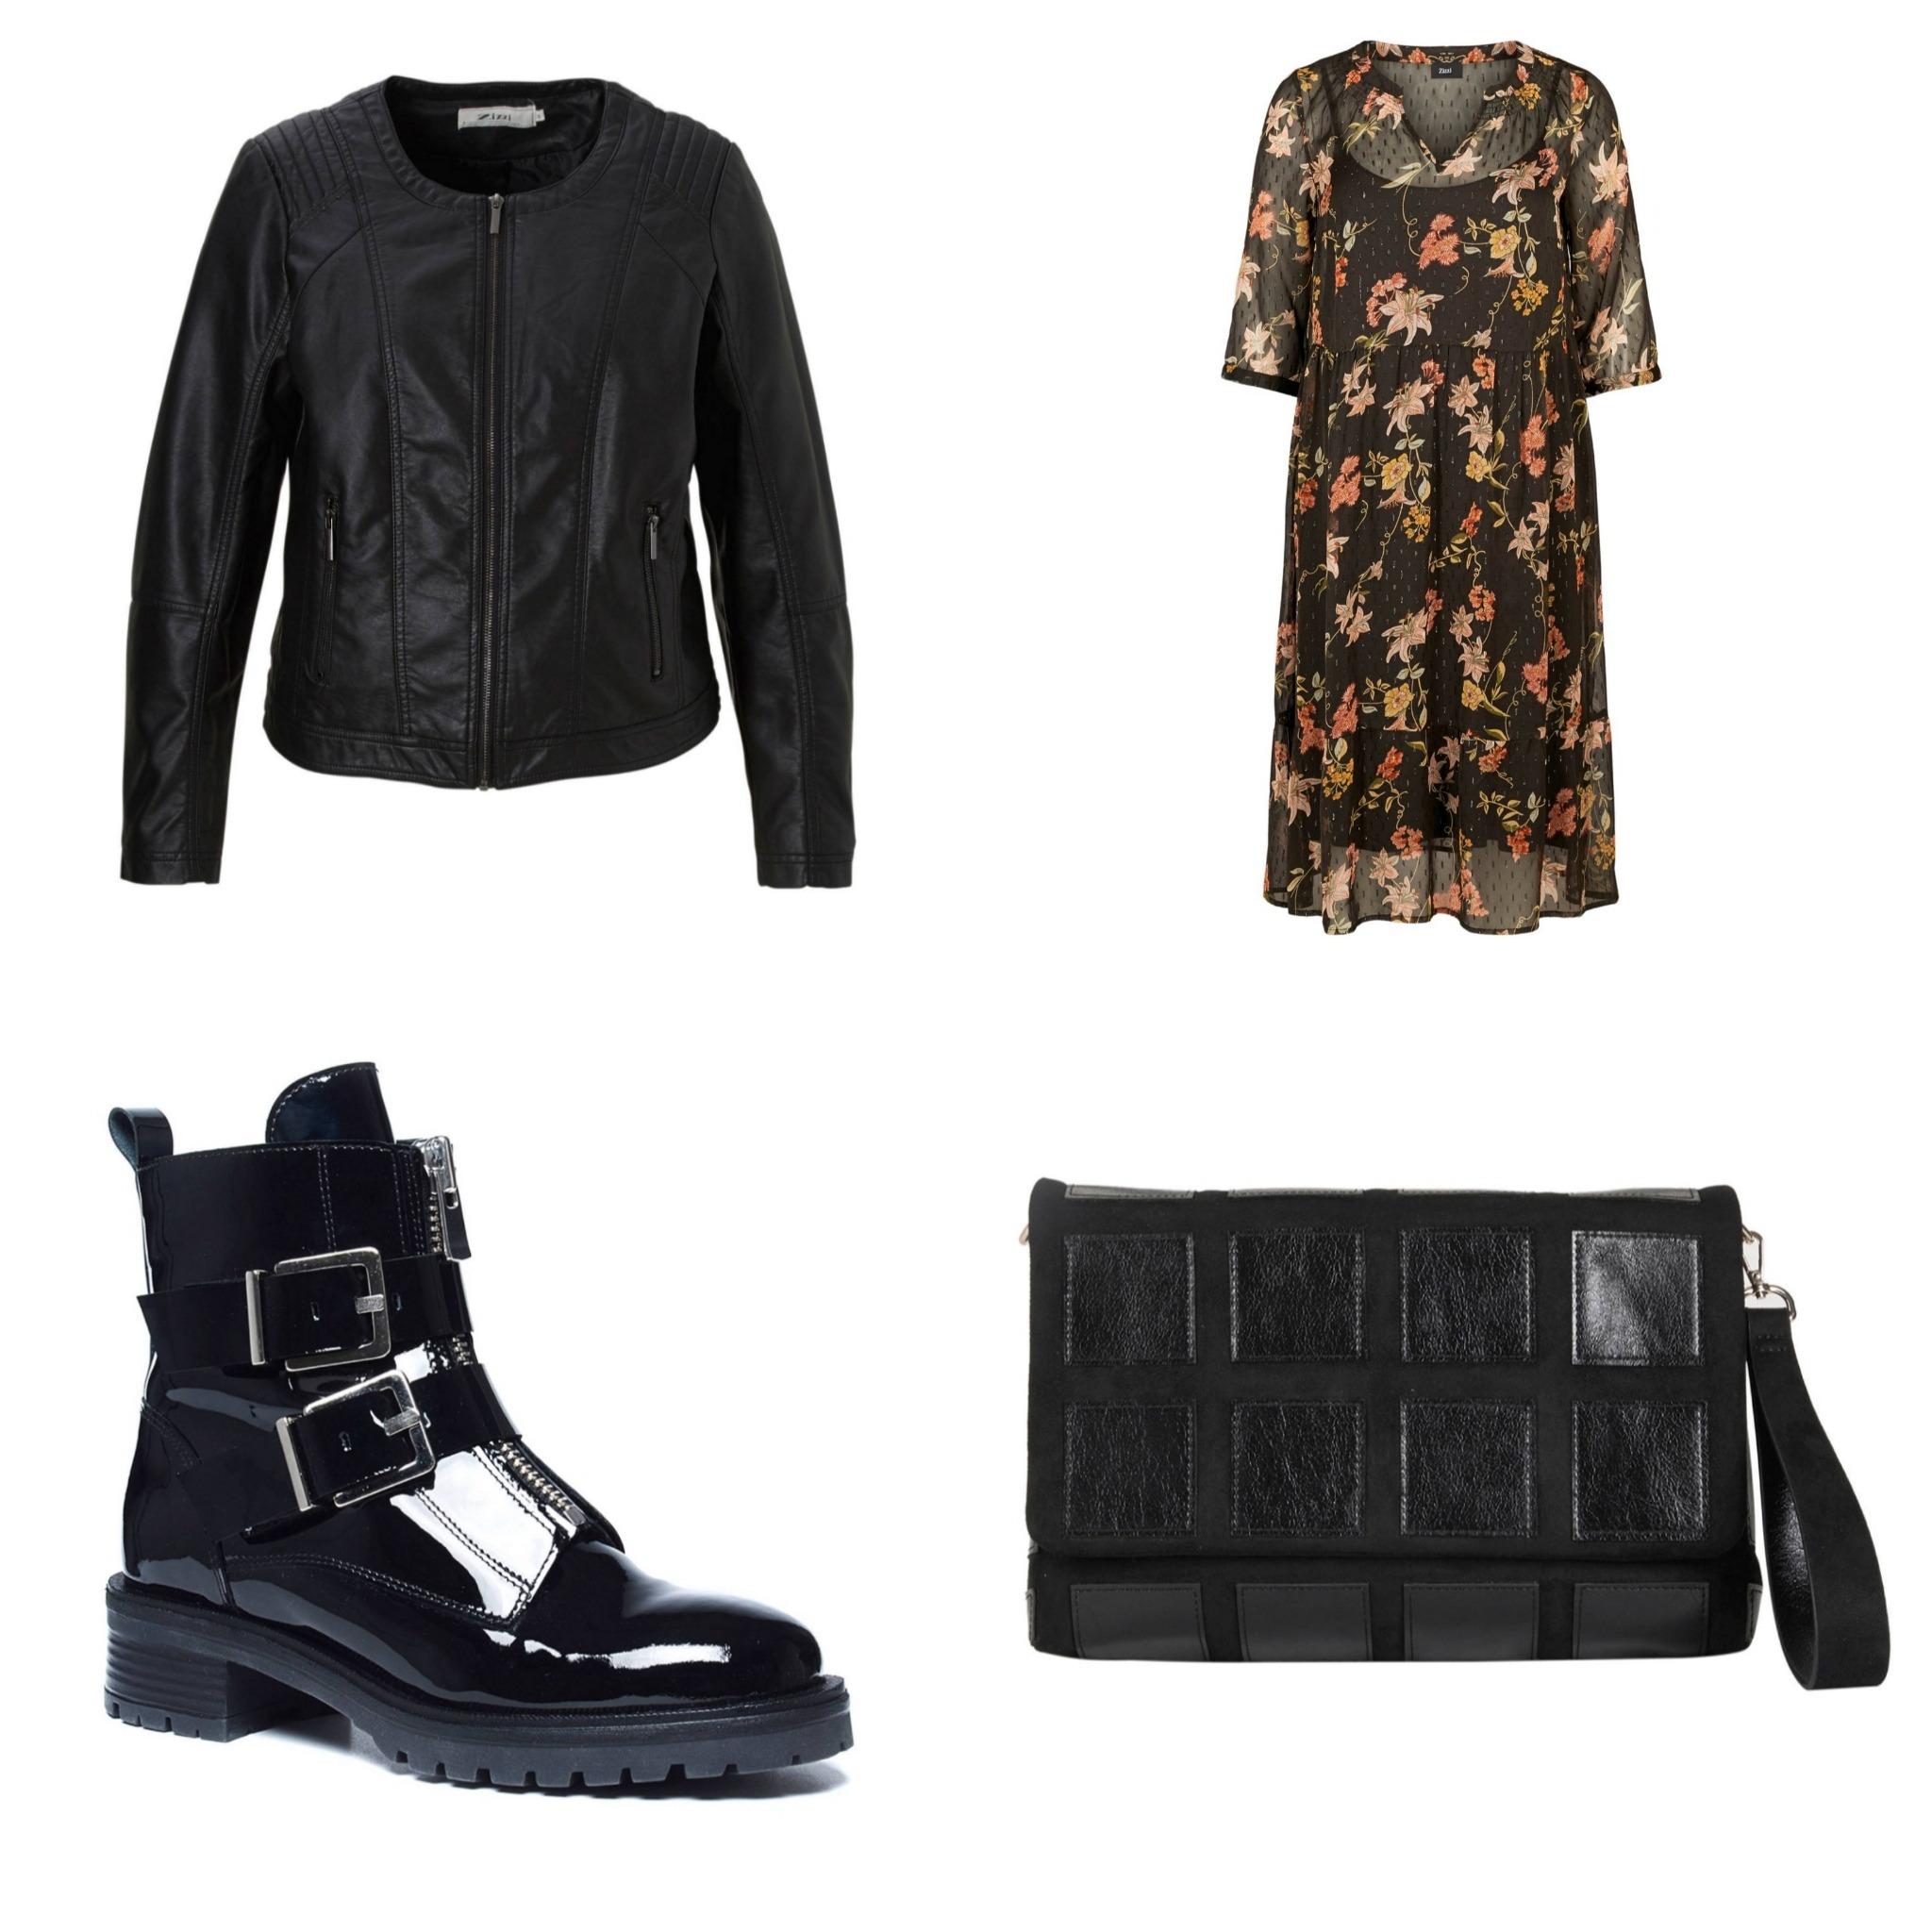 Plus Size Fashion Friday || Zizzi Fashion